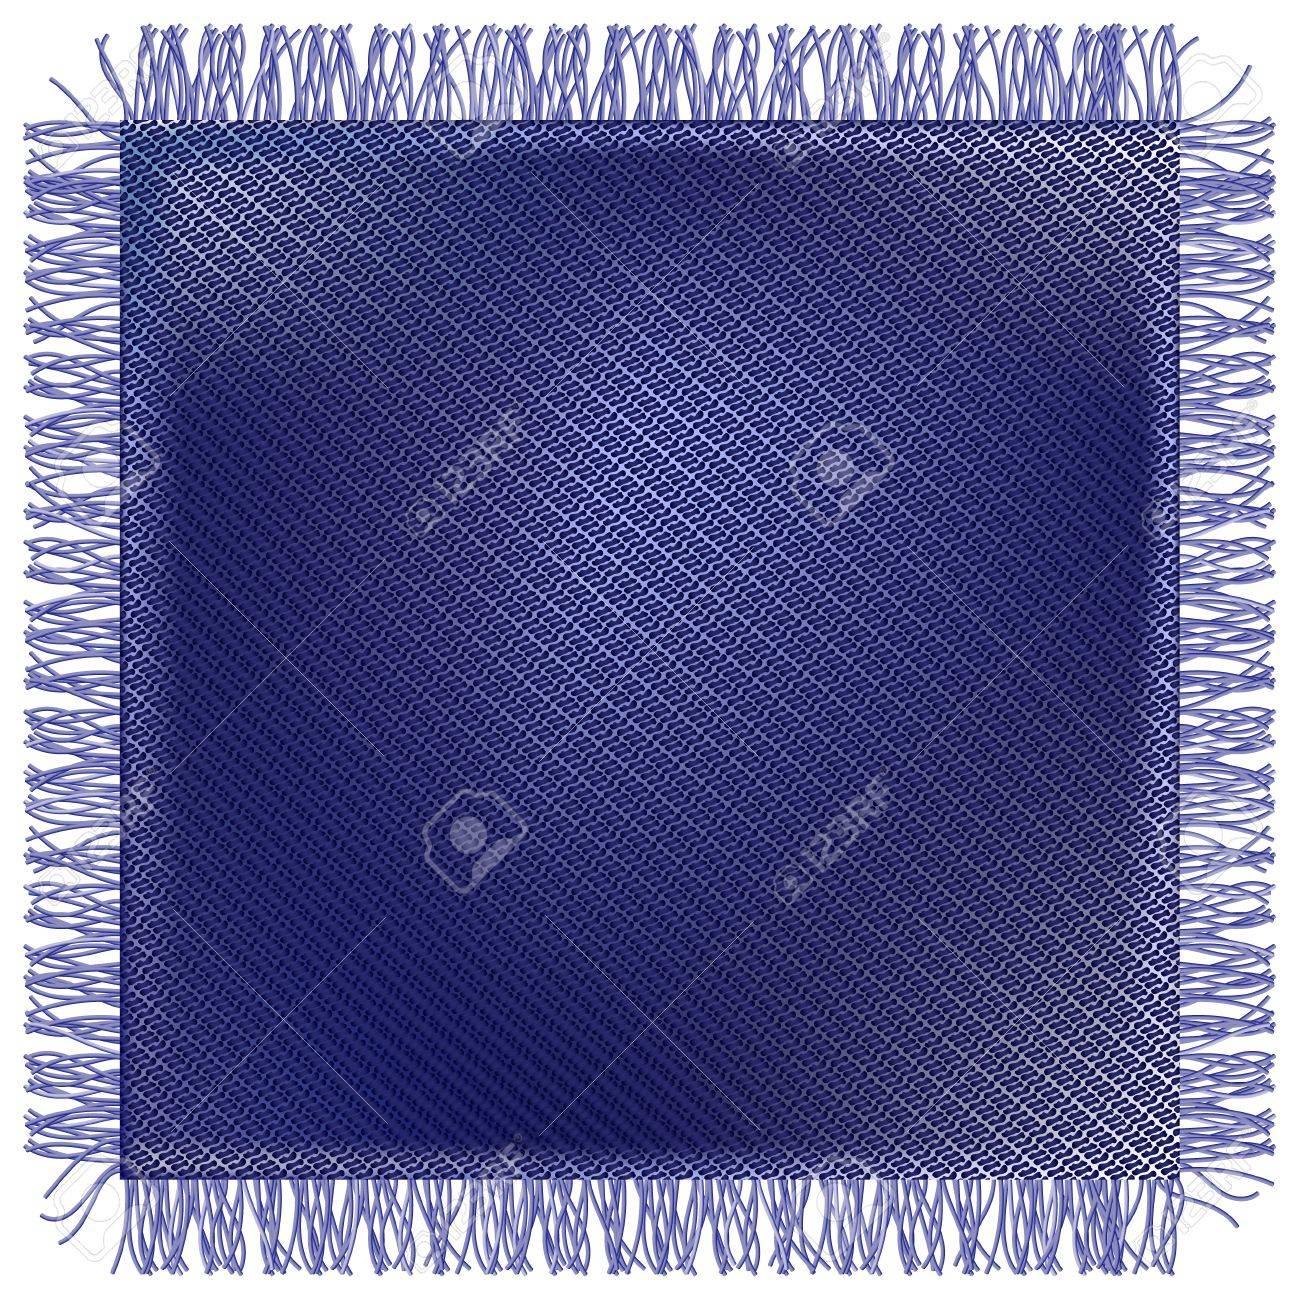 Flap threadbare jeans fabric with fringe Stock Vector - 17927483